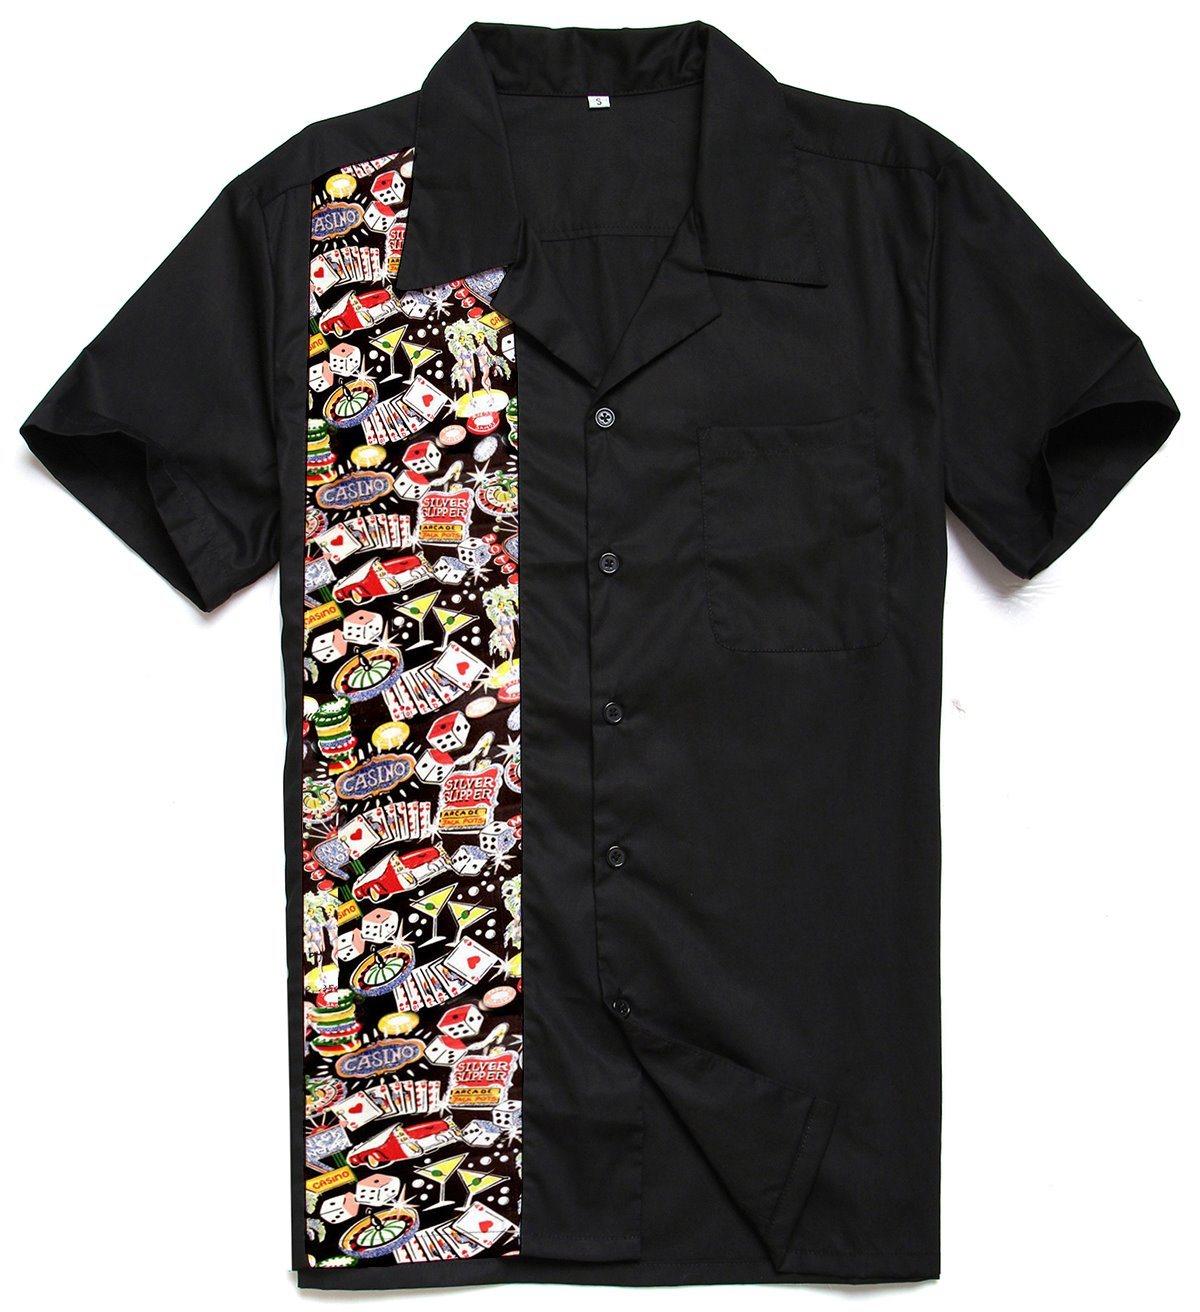 China Cotton Short Sleeve Latest Shirt Designs For Men 2017 Casino